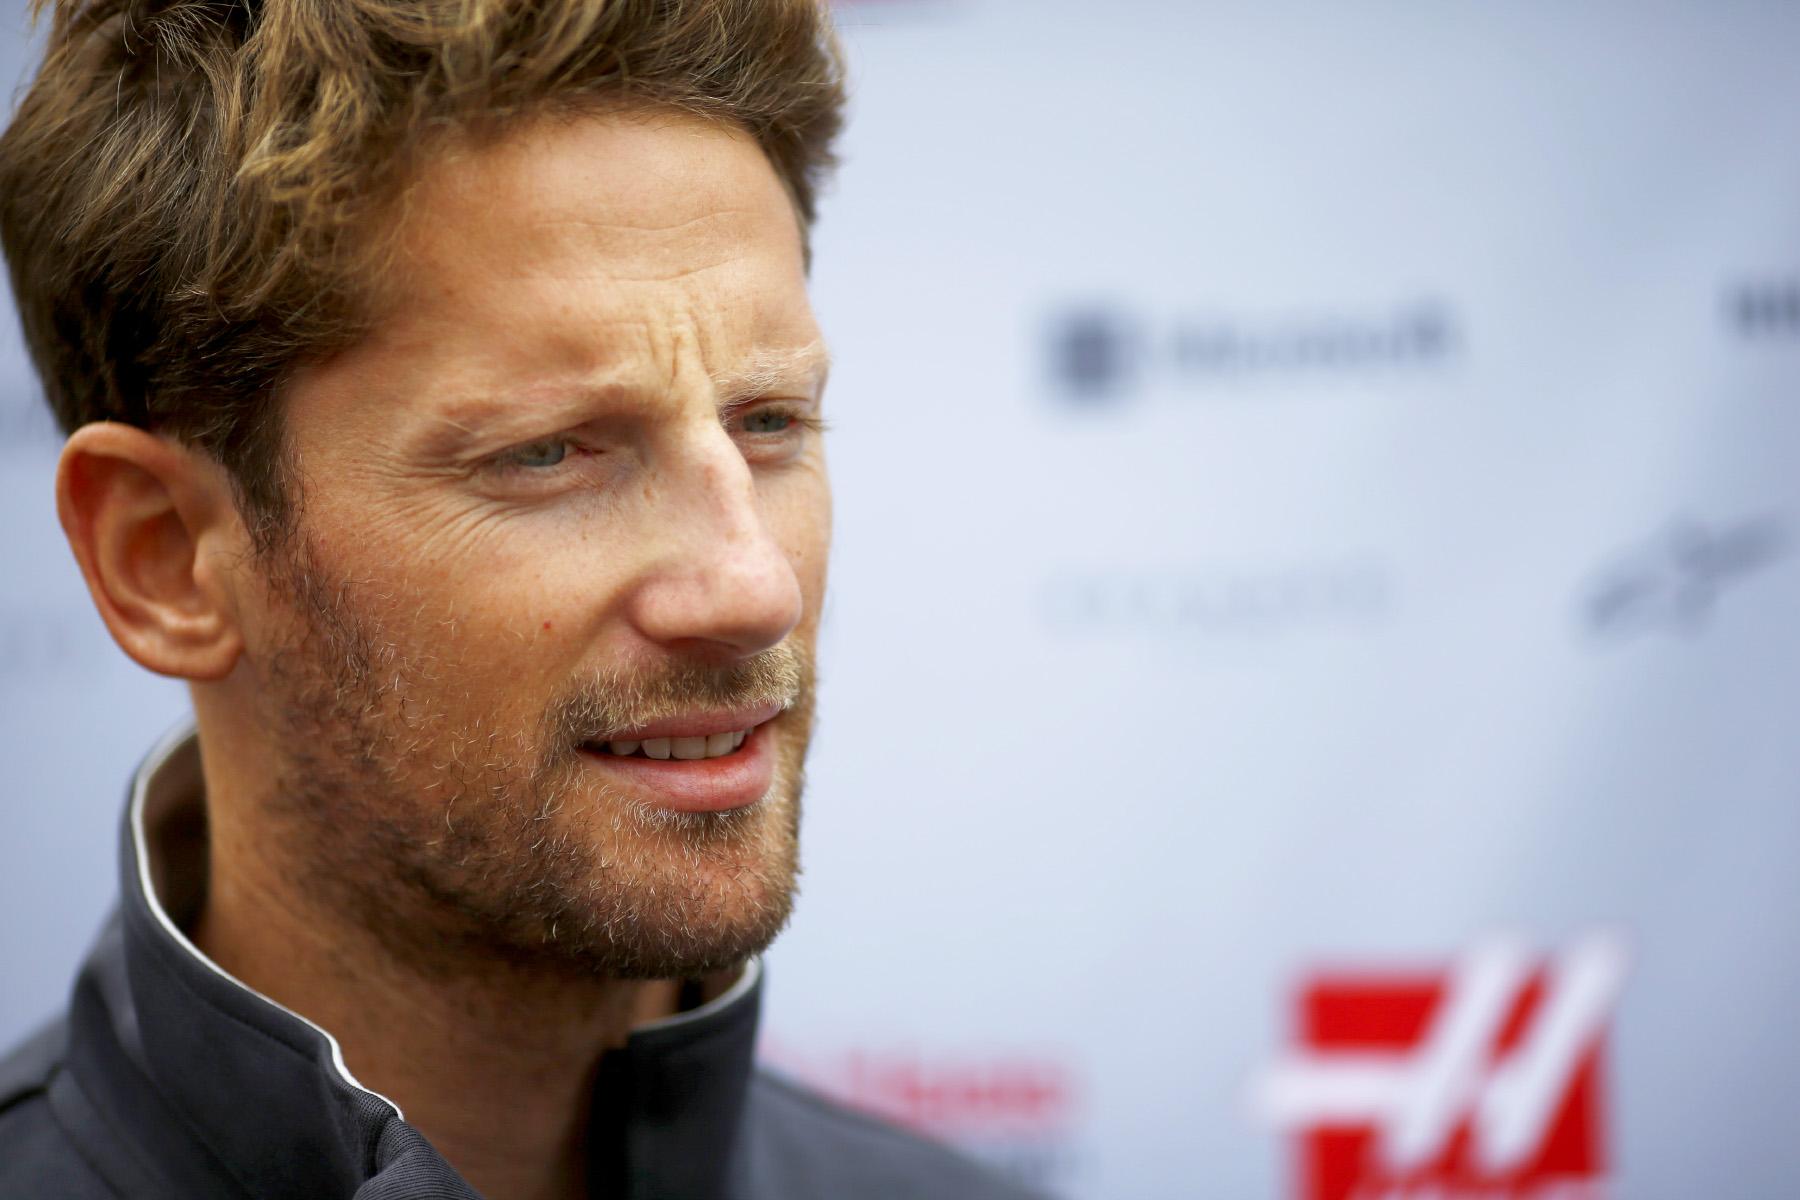 Romain Grosjean speaks to reporters at the 2017 Japanese Grand Prix.